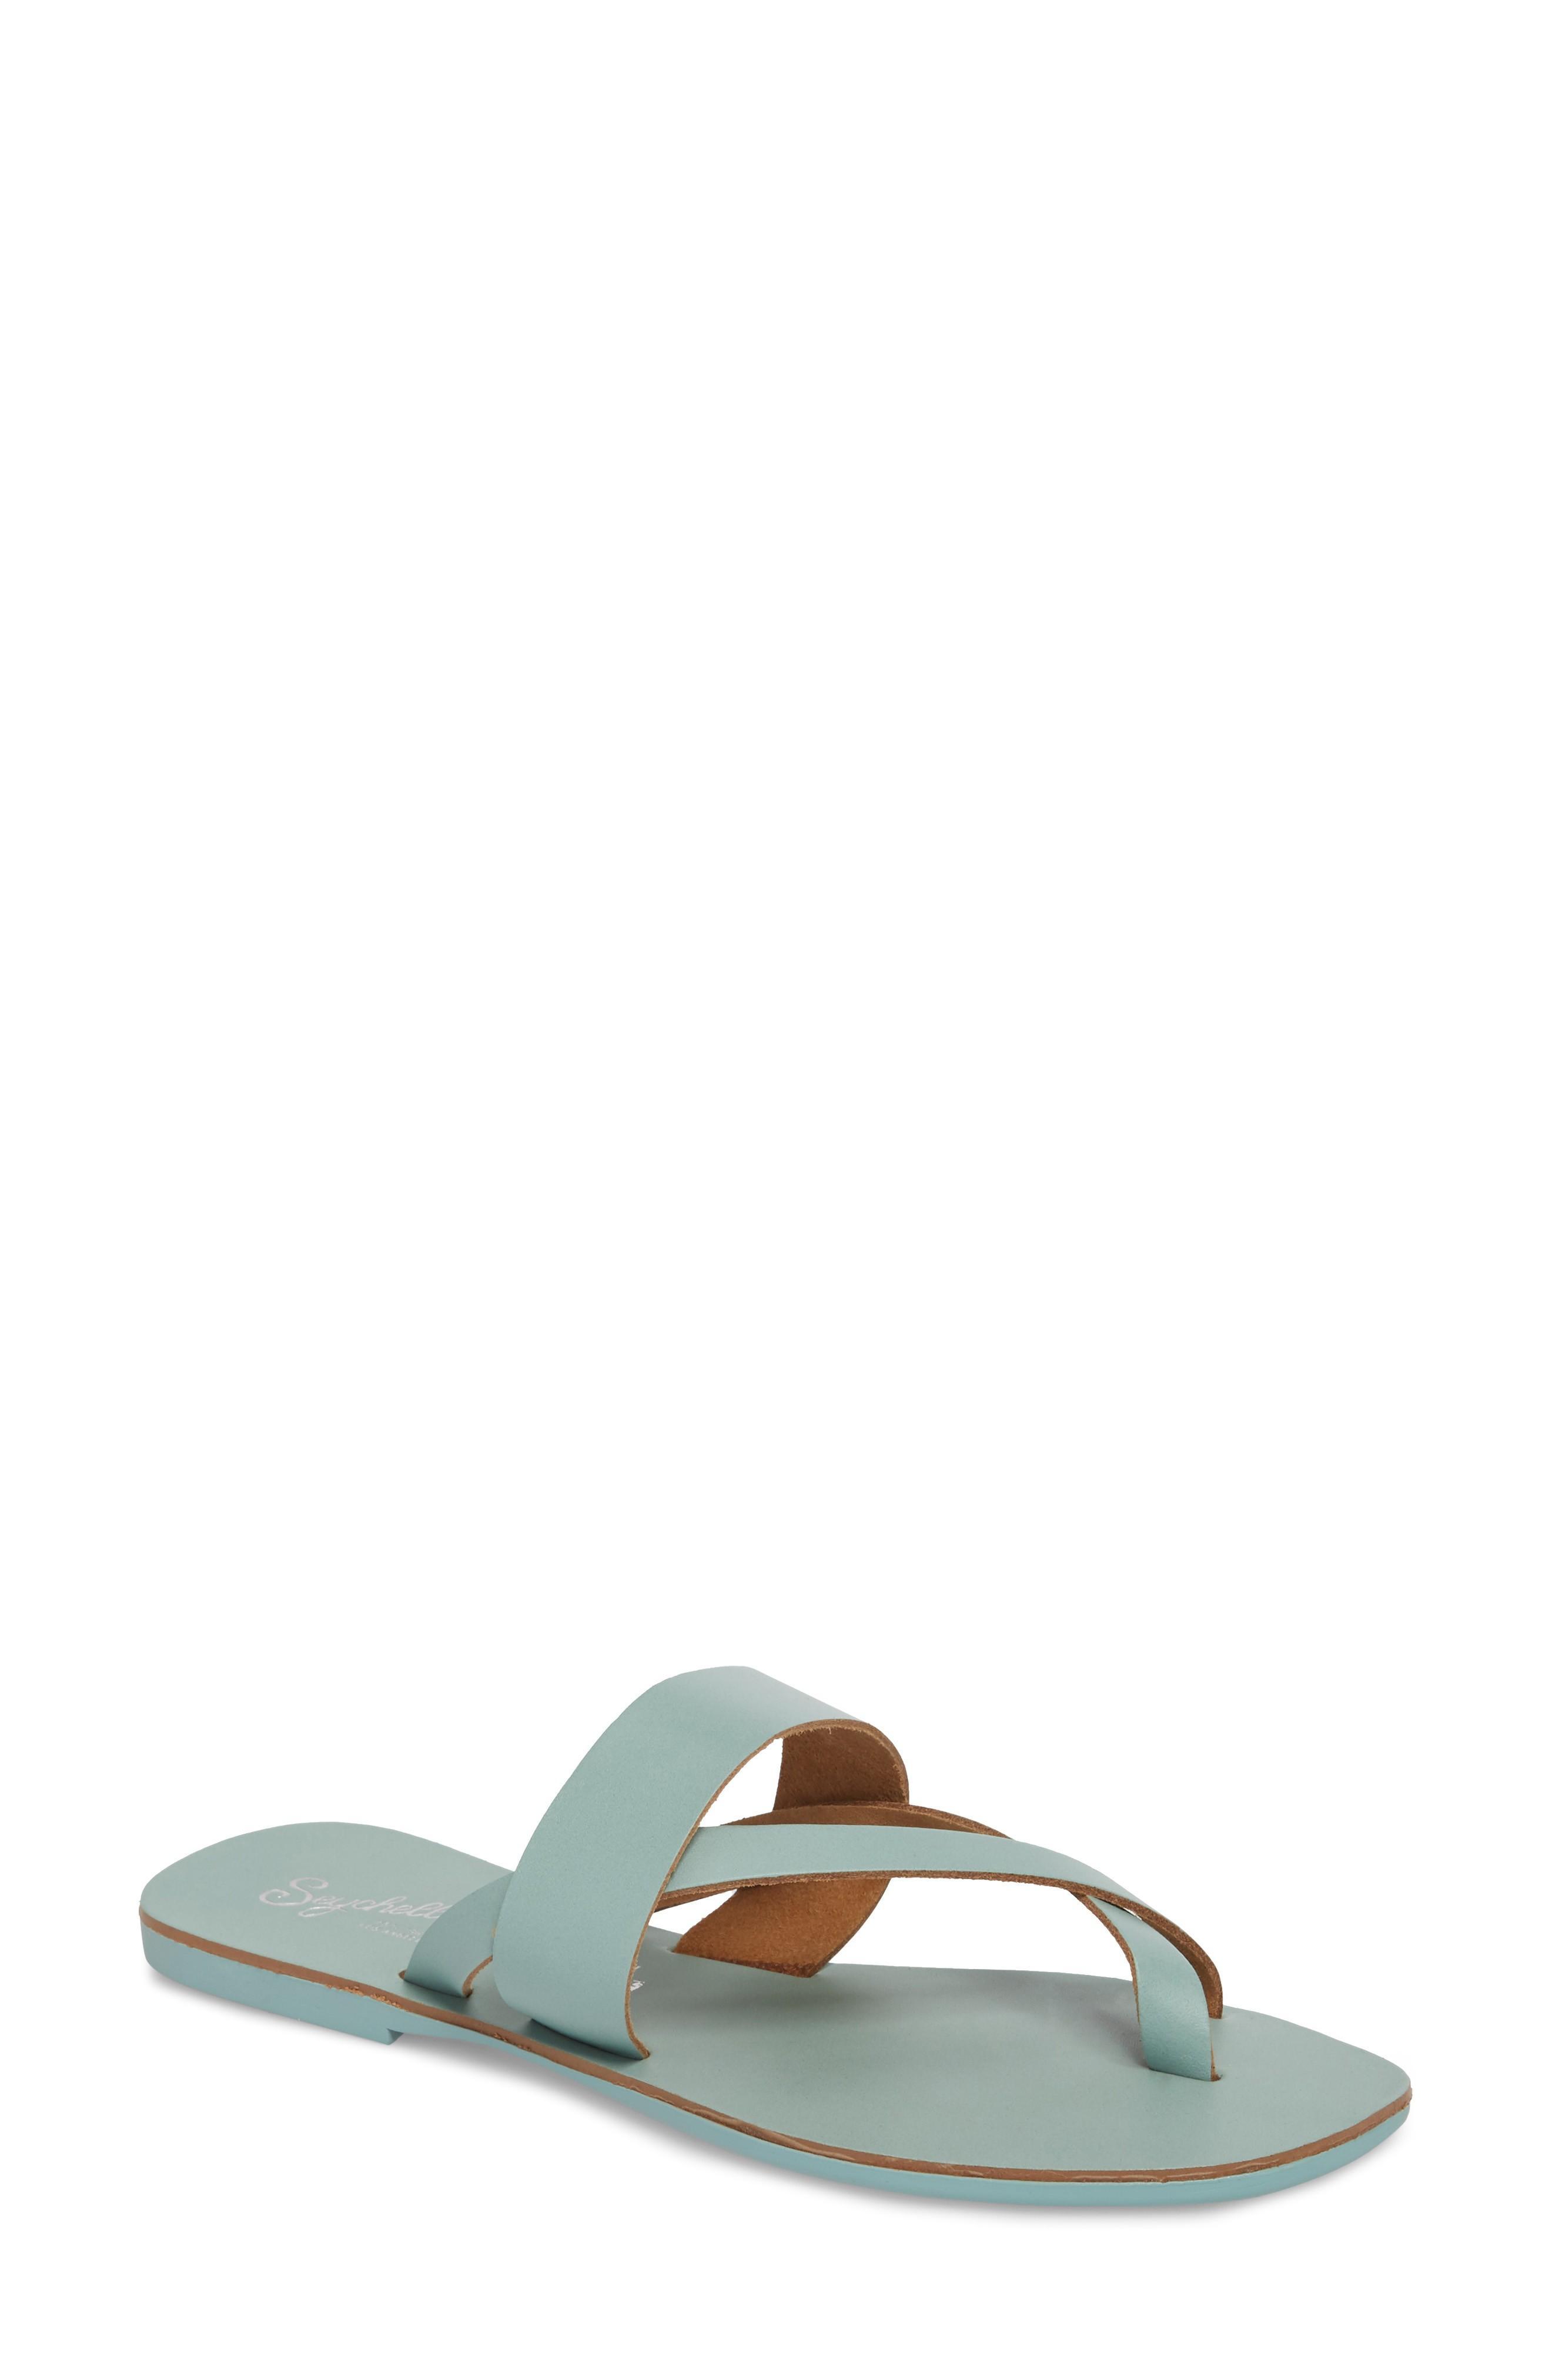 feb4593927c7 Seychelles Destiny Thong Sandal In Seafoam Leather